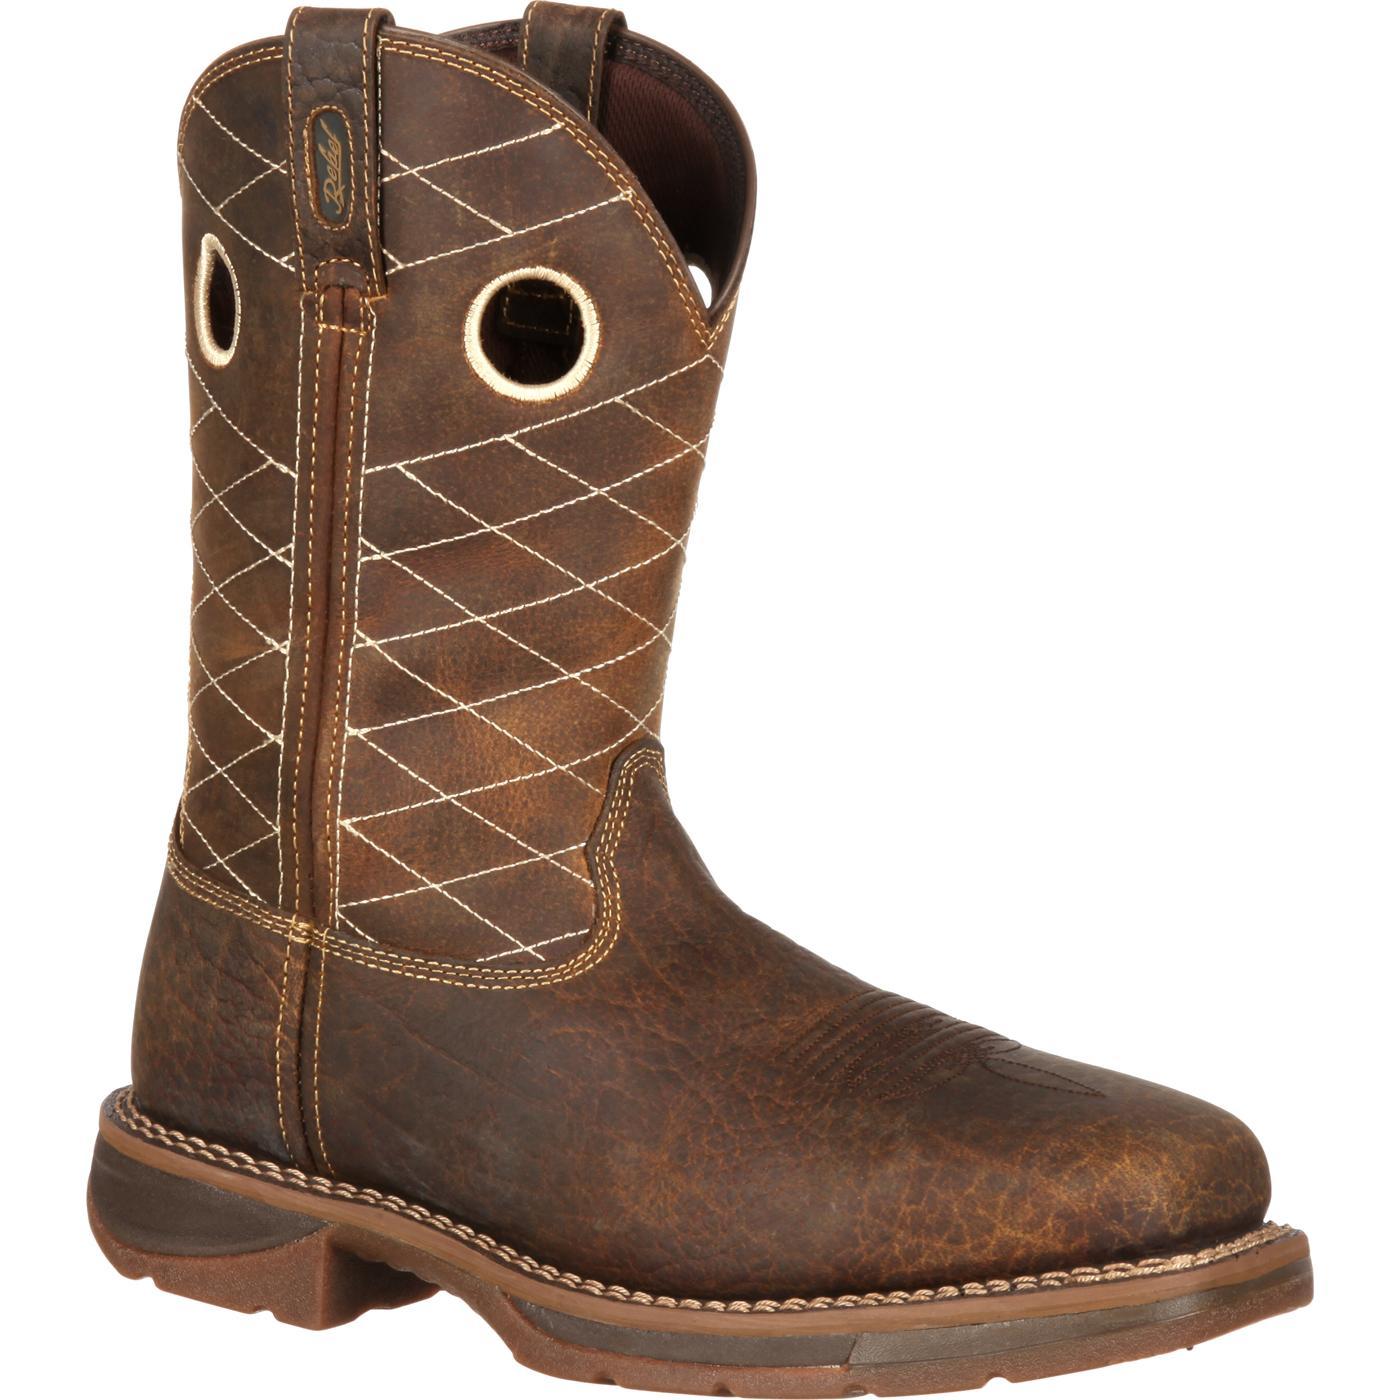 Workin' Rebel by Durango Brown Composite Toe, , large